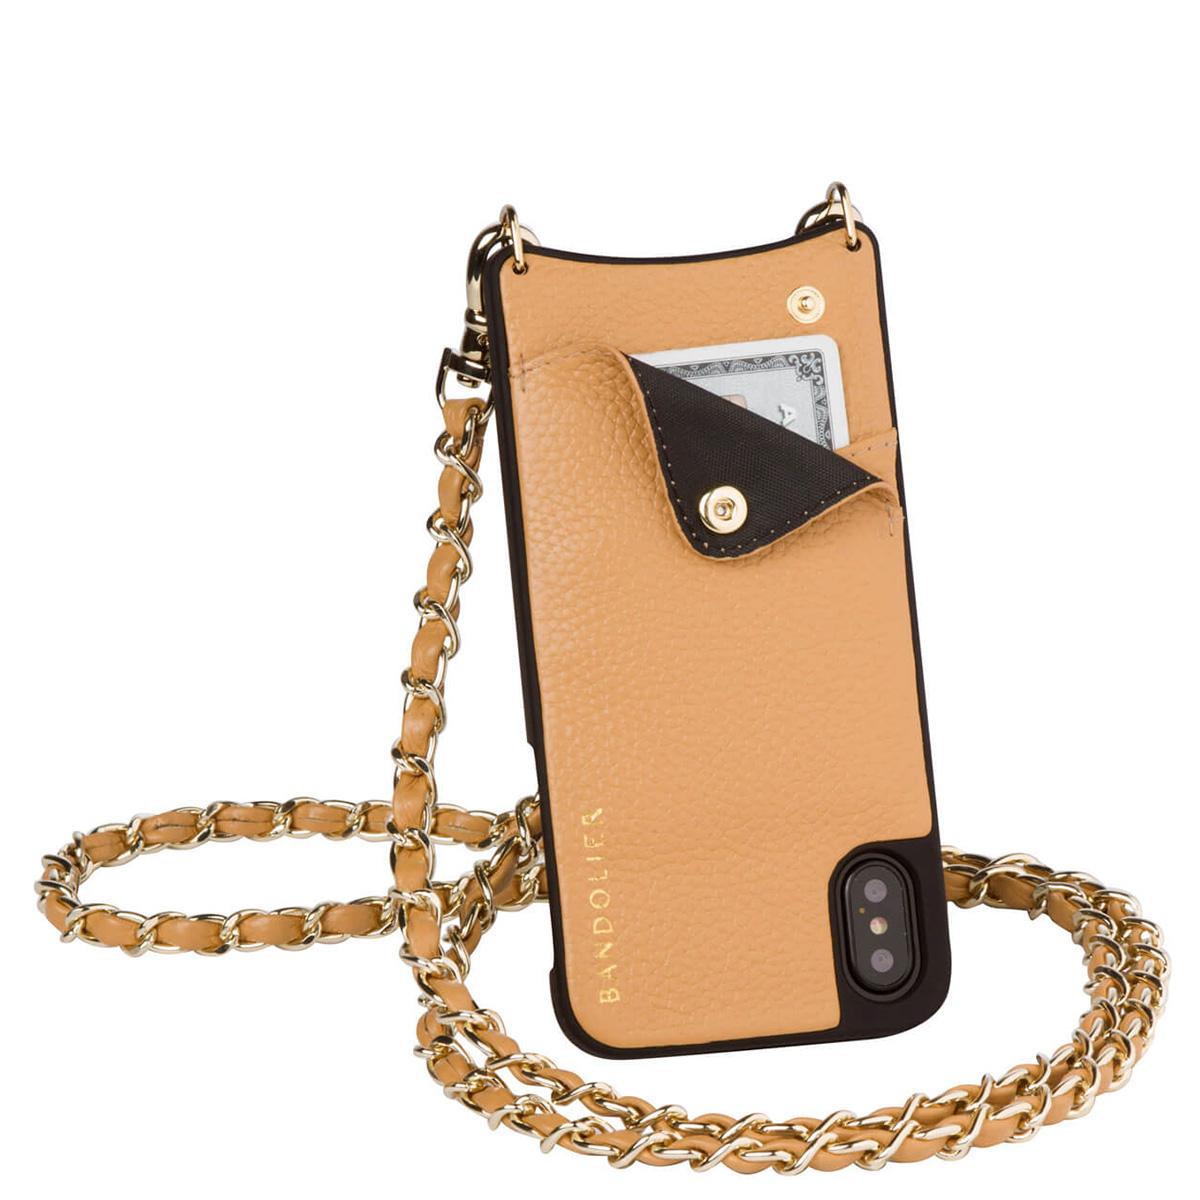 BANDOLIER iPhoneX LUCY GOLDENROD バンドリヤー ケース スマホ アイフォン レザー メンズ レディース [189]